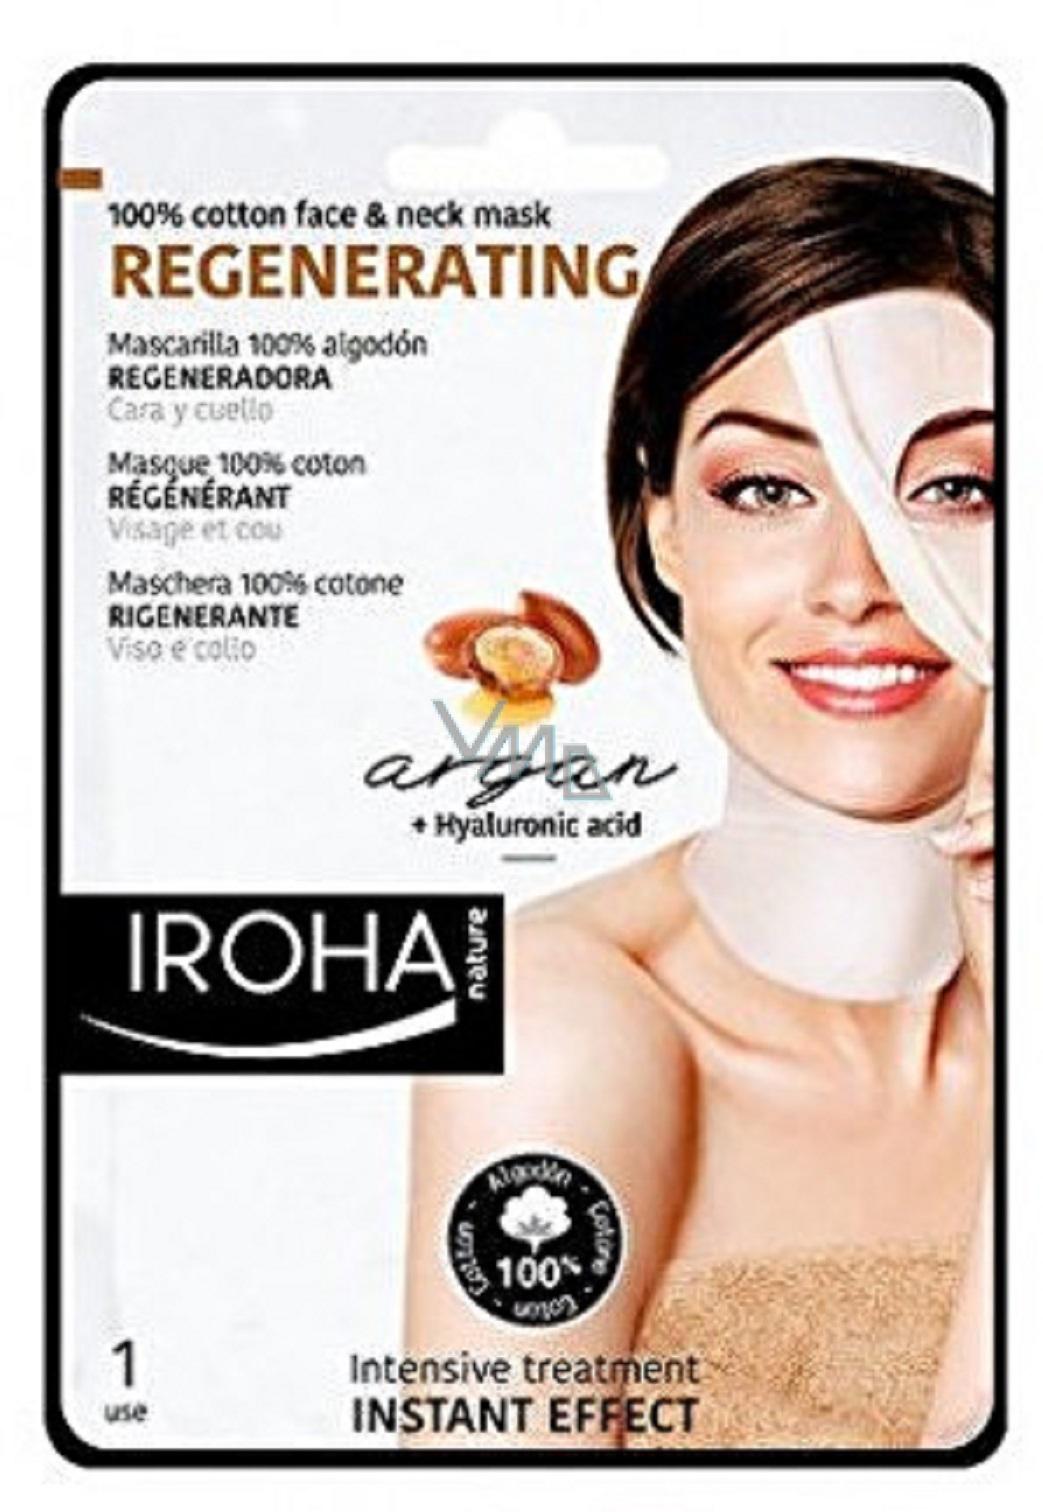 Iroha Cotton Regenerating Mask 1532